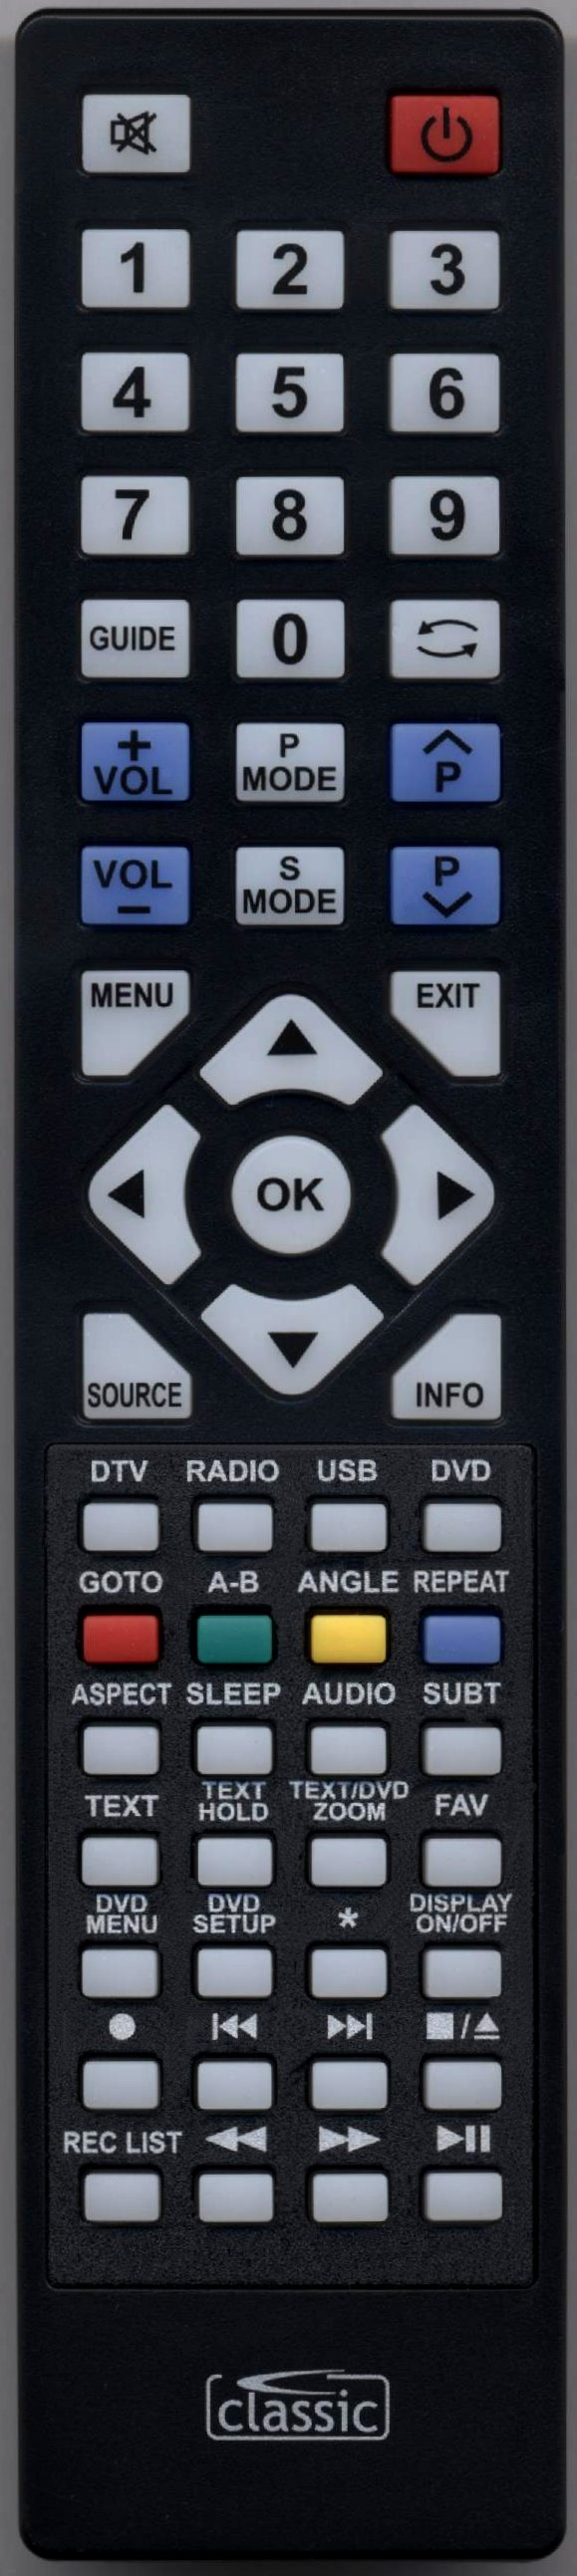 Blaupunkt 32/136I-WB-11B-HKU-UK Remote Control Alternative